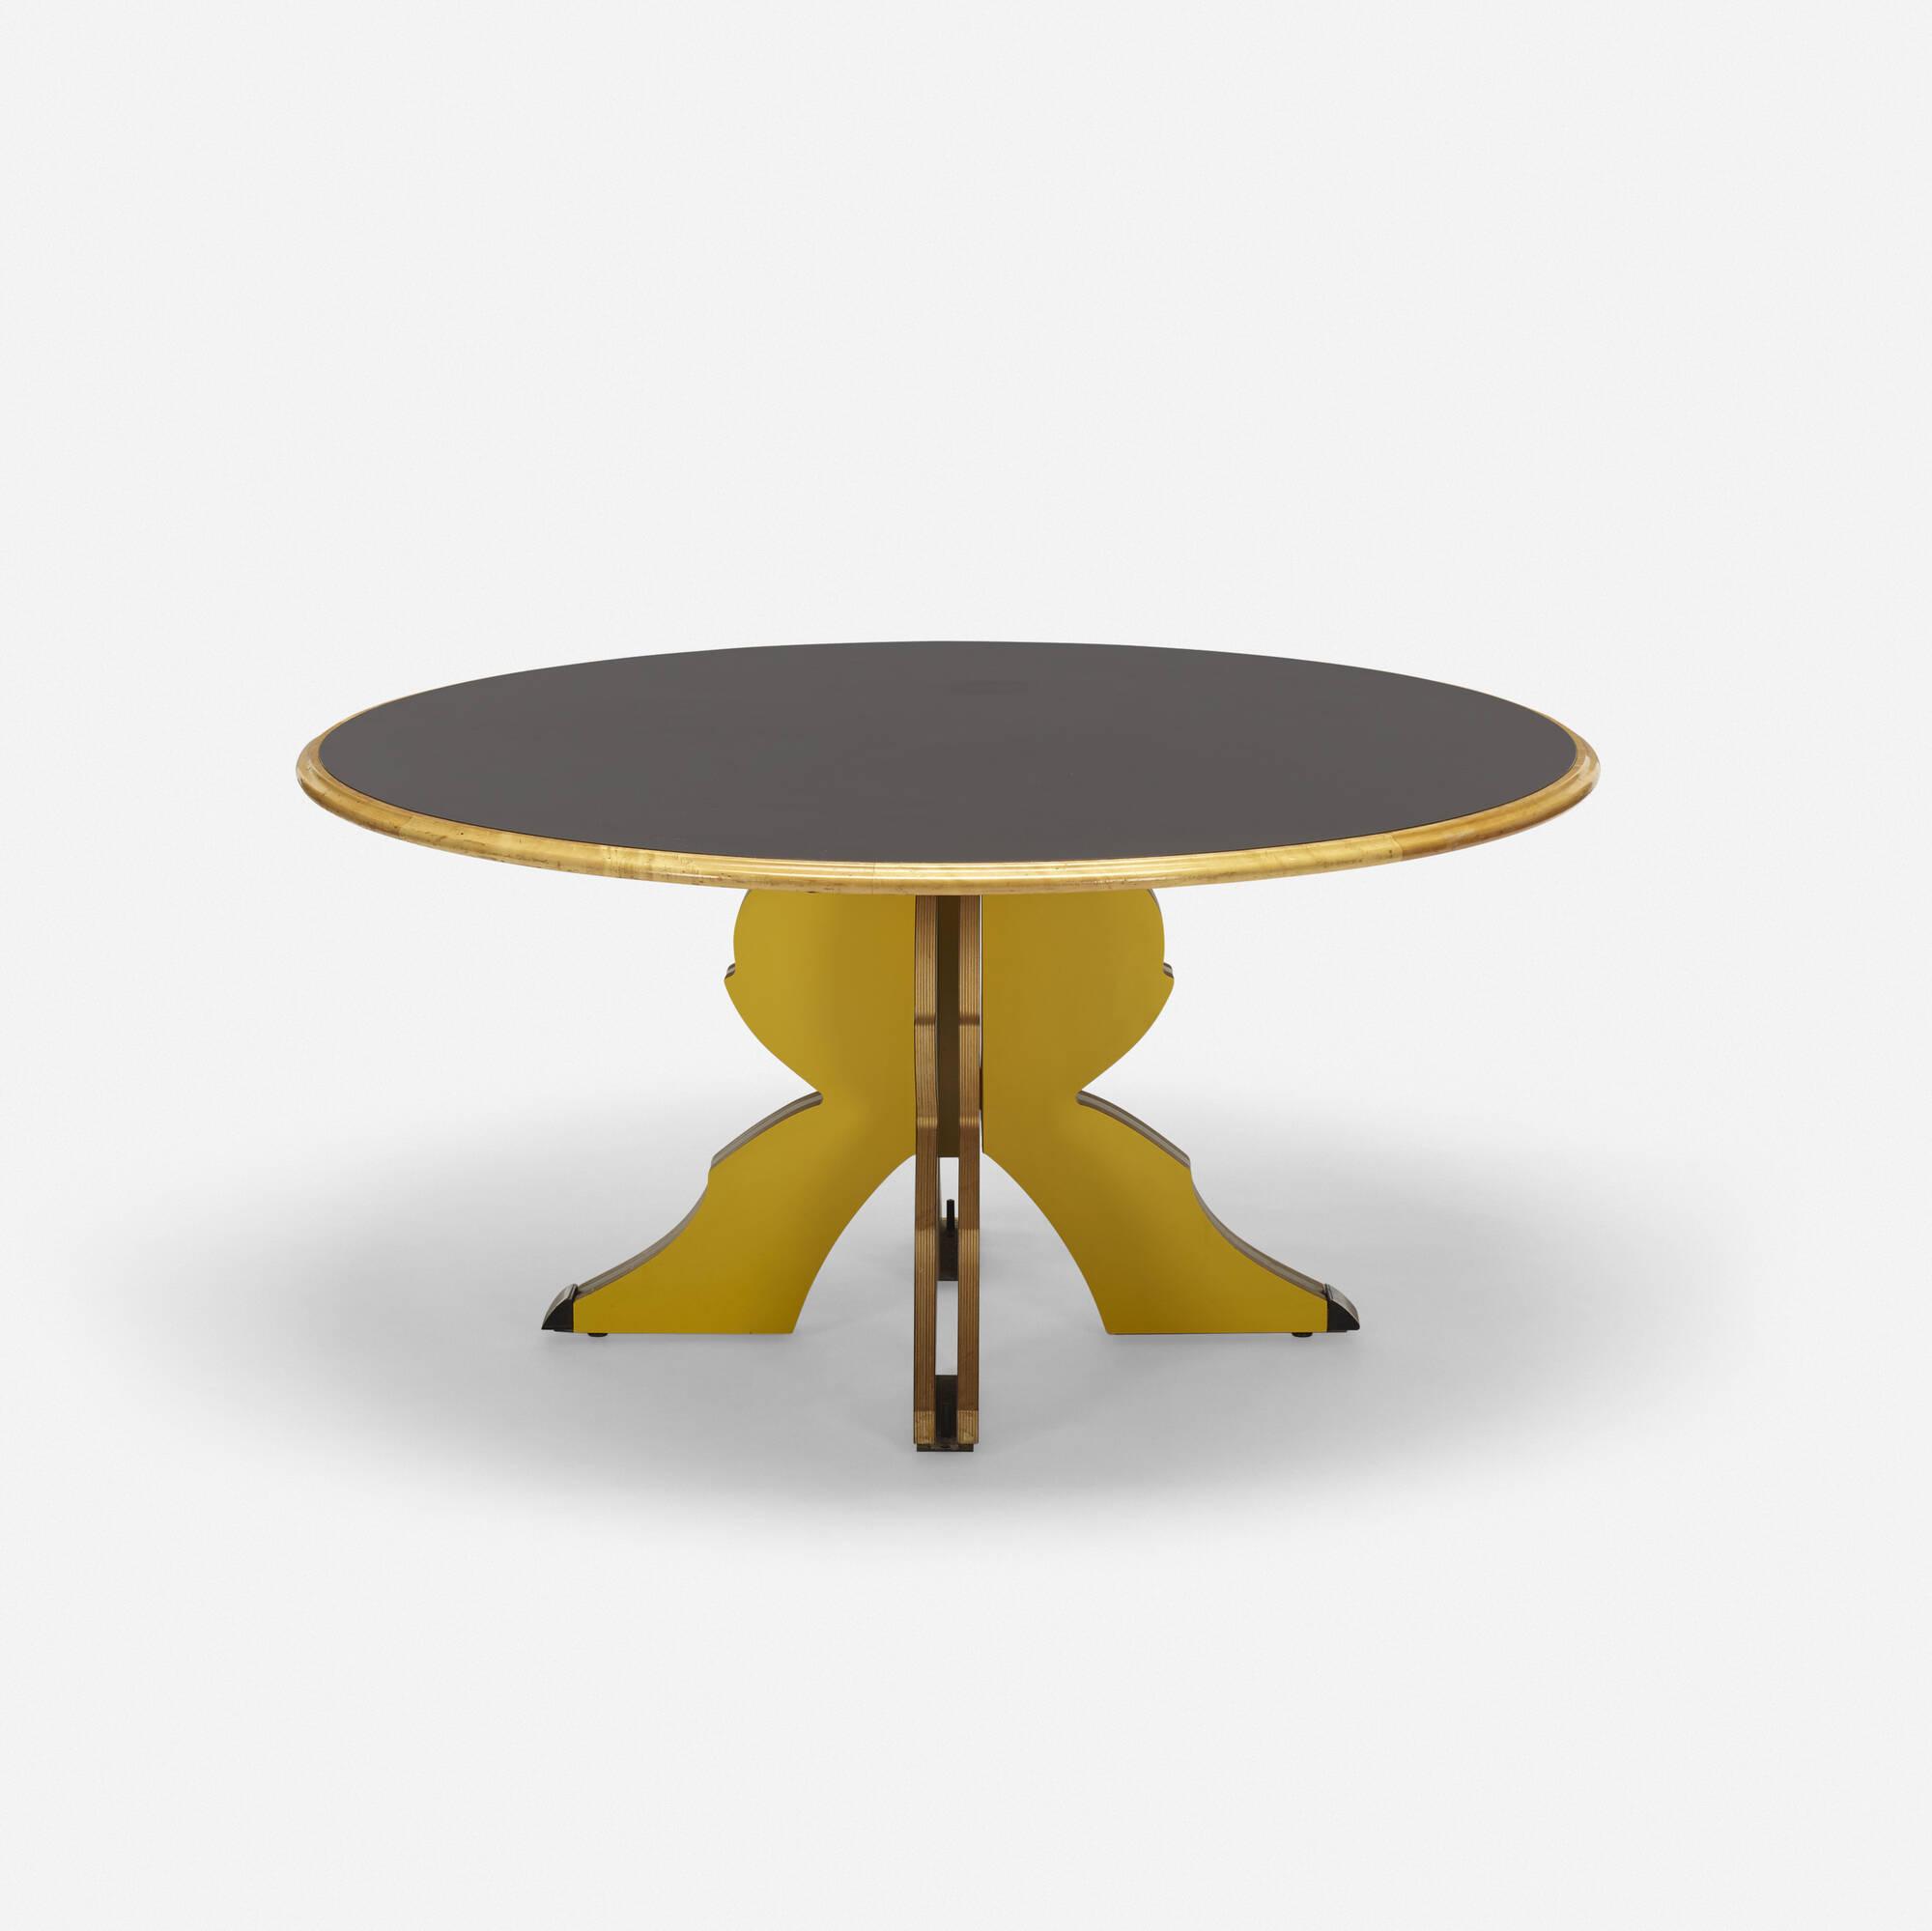 404: Robert Venturi / Urn dining table (1 of 3)